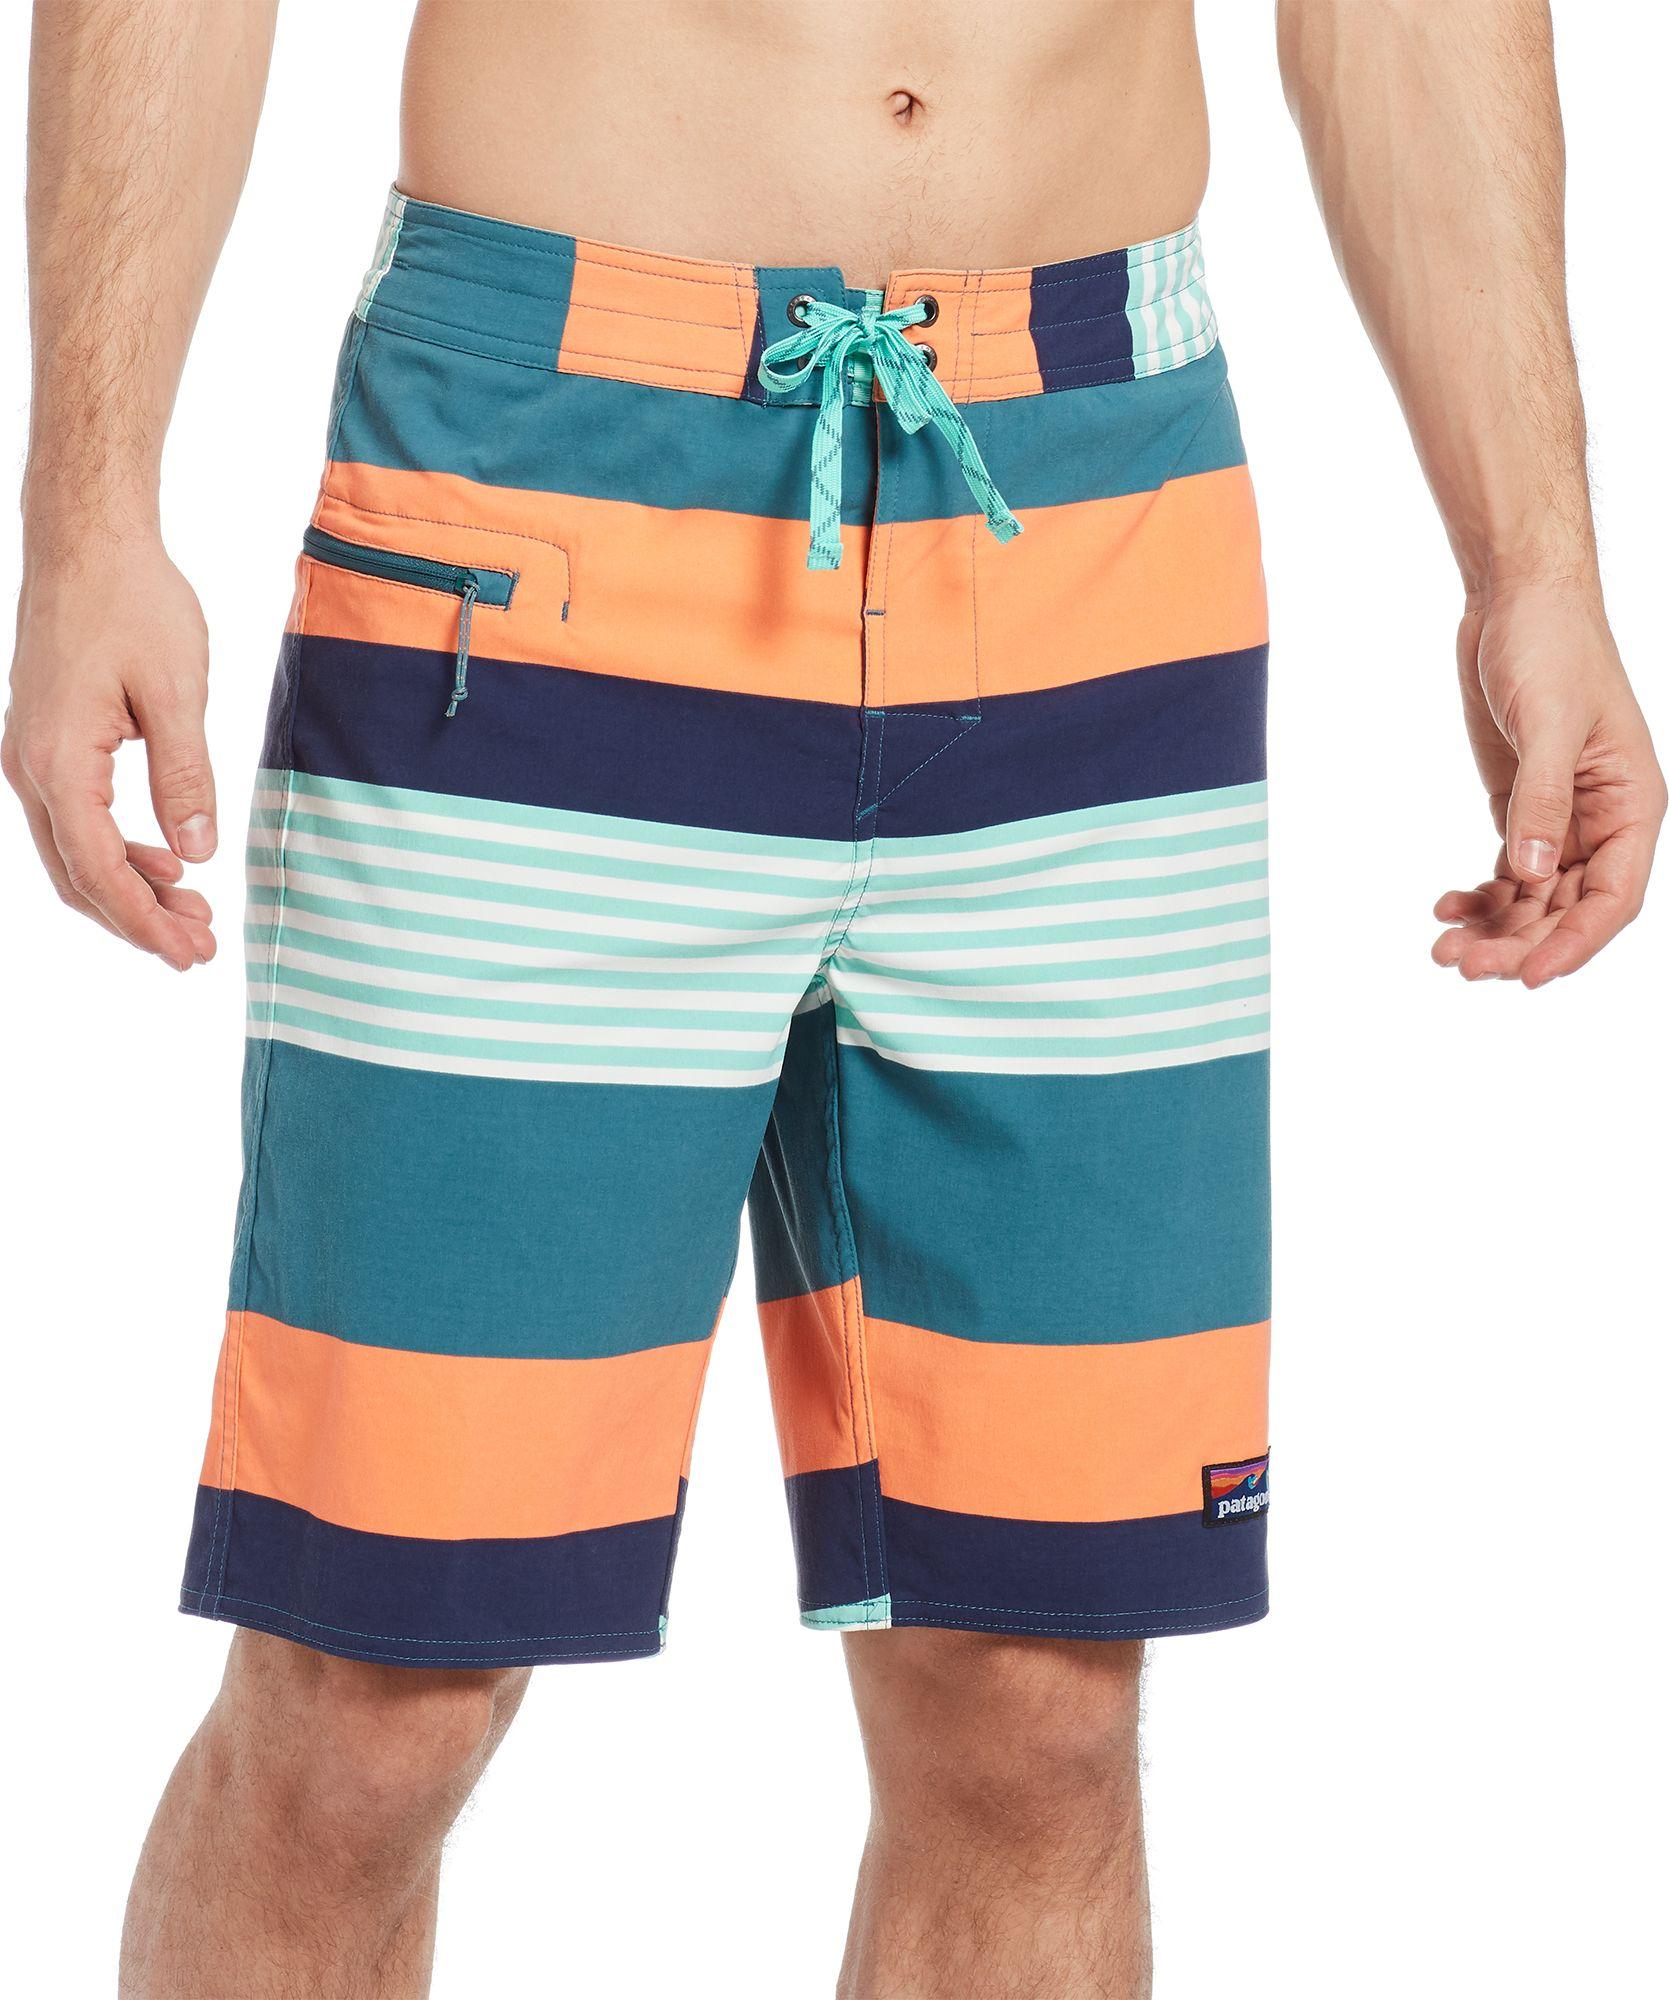 "0b683286d0 Patagonia Men's Stretch Wavefarer 21"" Board Shorts   DICK'S Sporting ..."